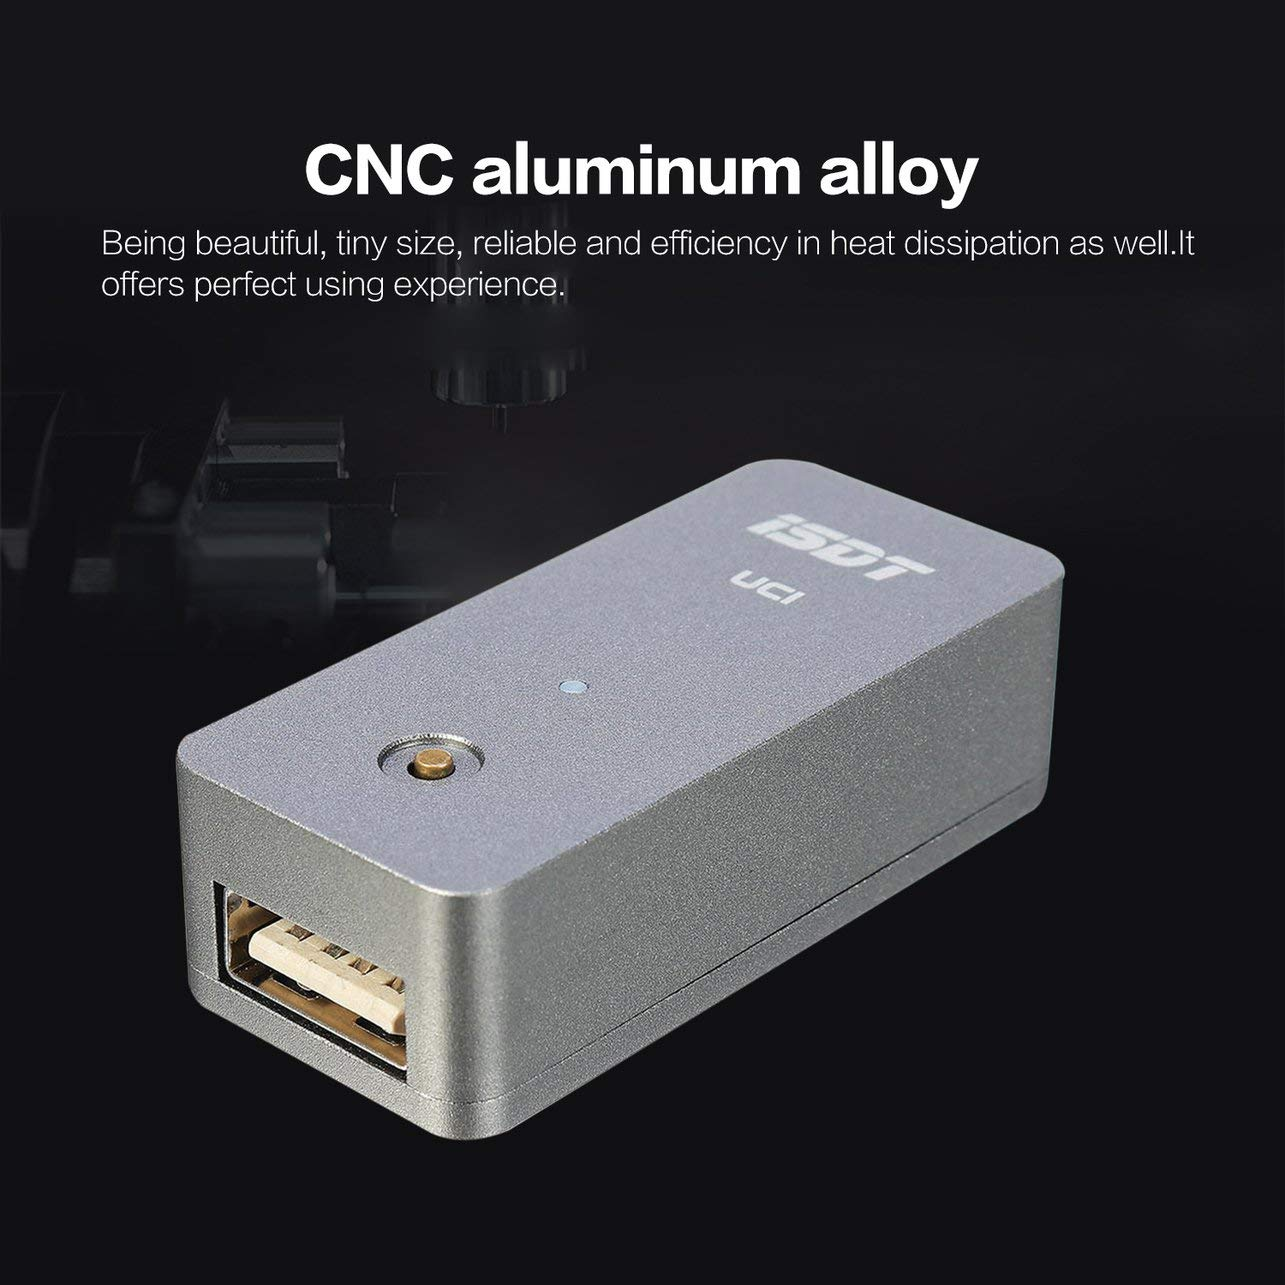 WOSOSYEYO CNC-Aluminiumlegierung Tiny ISDT UC1 18W 2A Mini Schnelllade Smart-USB-Ladeger/ät Unterst/ützung 2.0 FCP 3.0 BC1.2 XT60-Eingang Silber